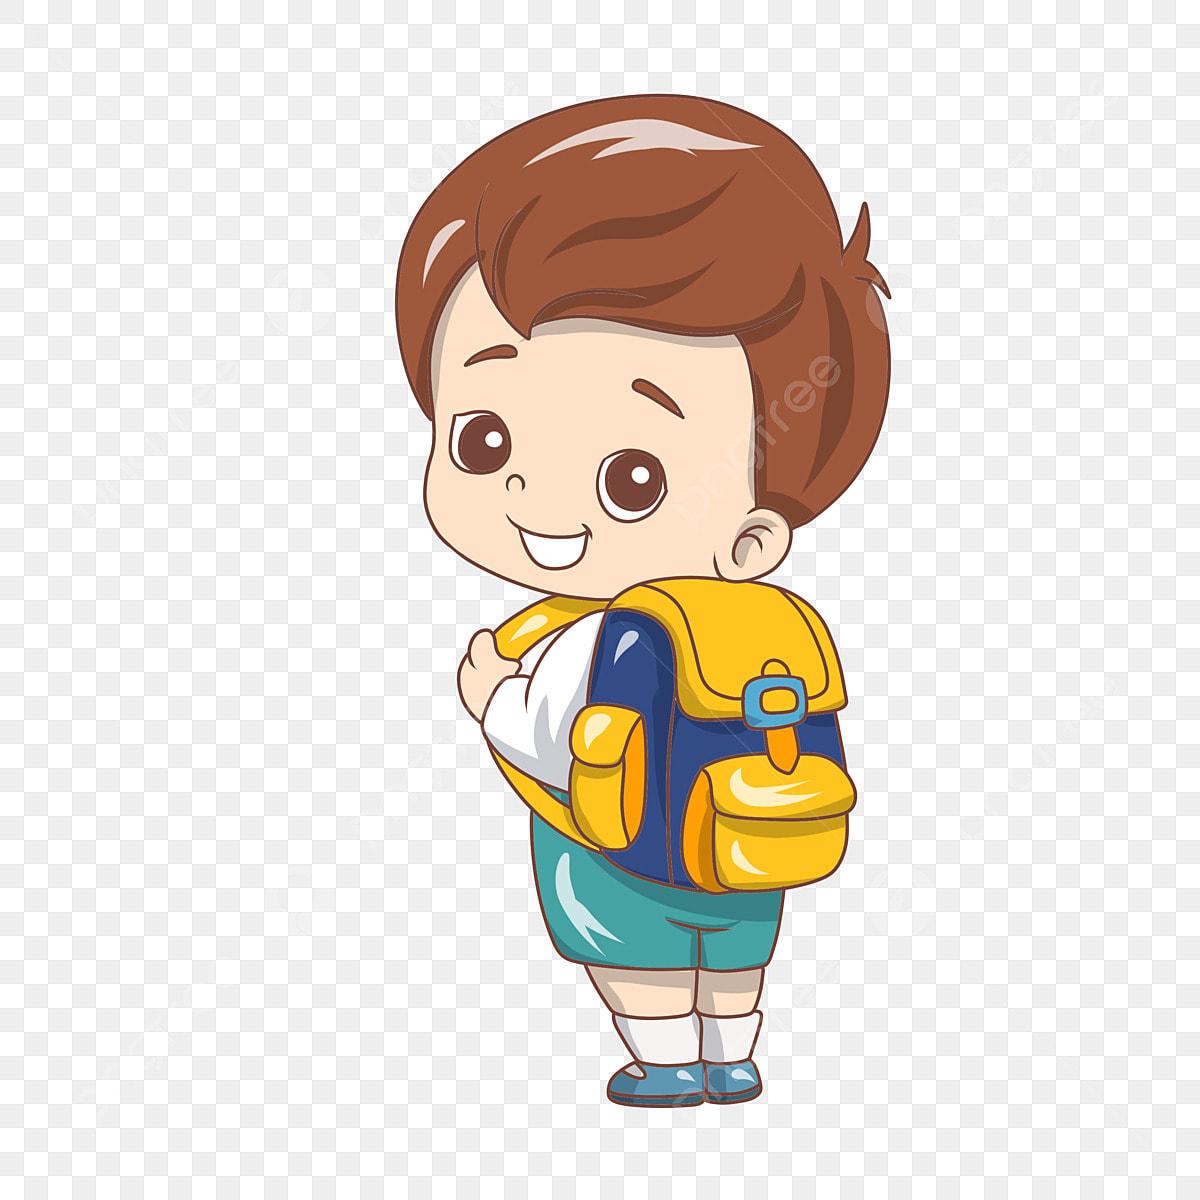 بصيرة تسوية مزعج صور بنات رسم كرتوني مع حقائب مدرسية تصميم فوتوشوب Png Natural Soap Directory Org